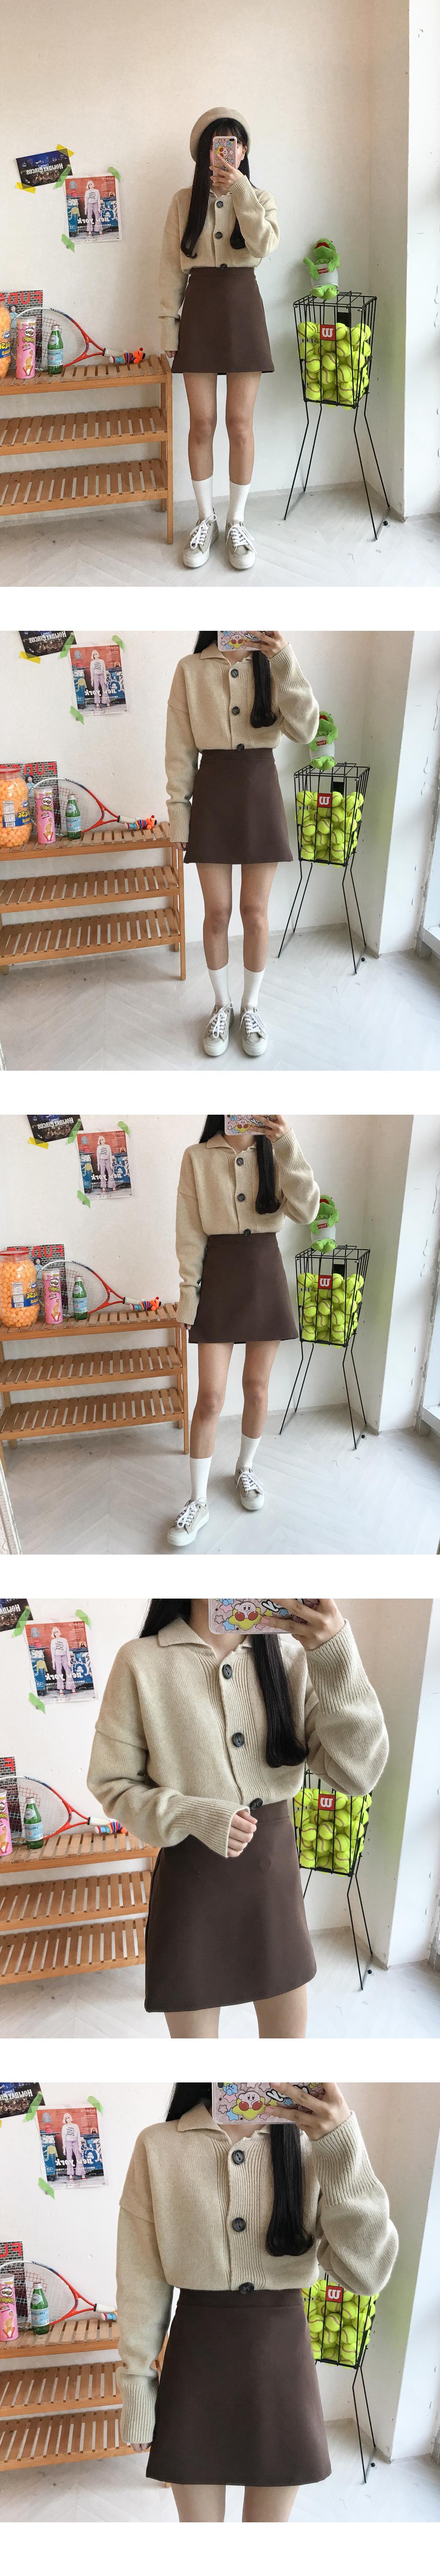 Max Daily Skirt